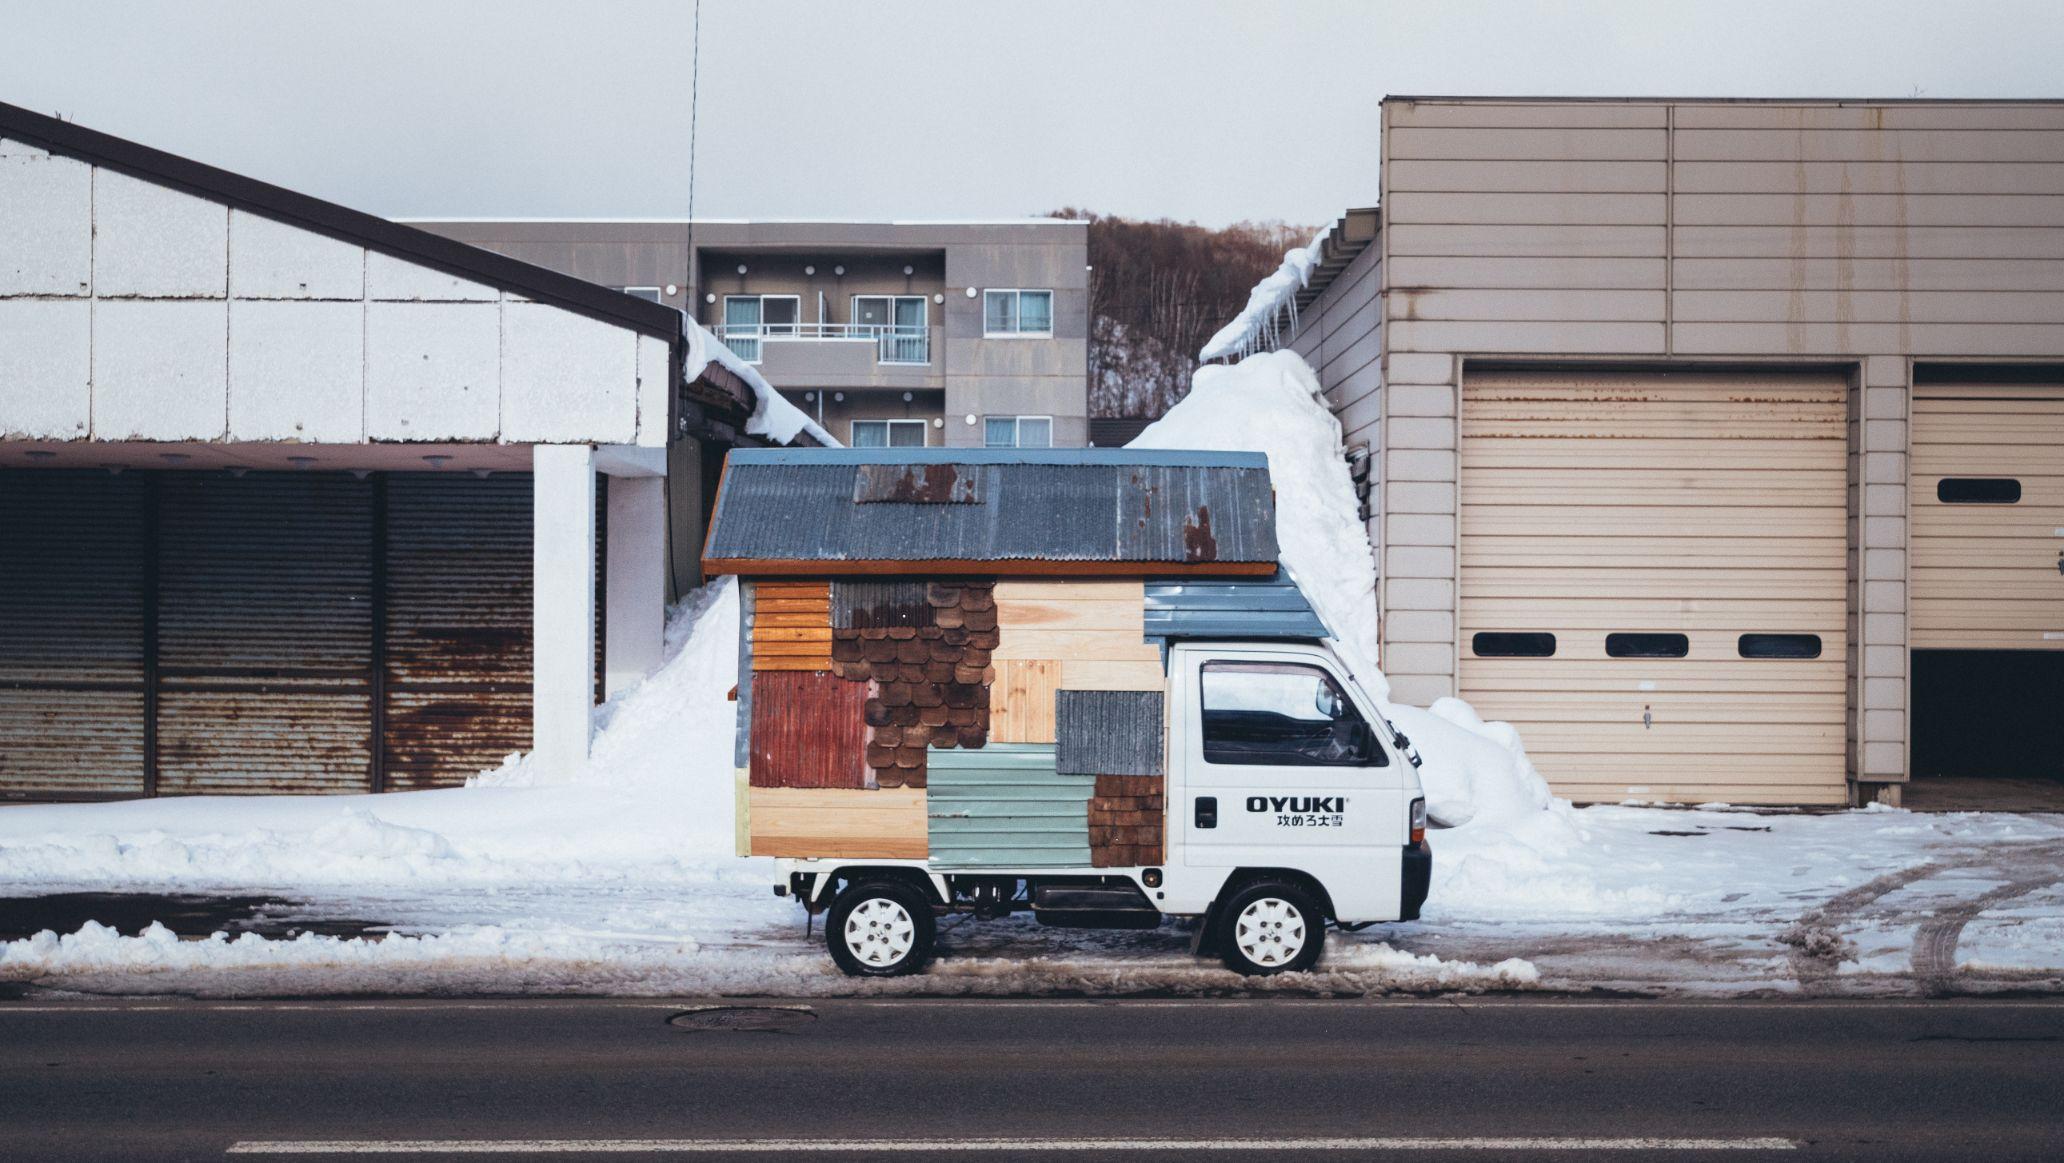 Small camper van in front of industrial buildings.